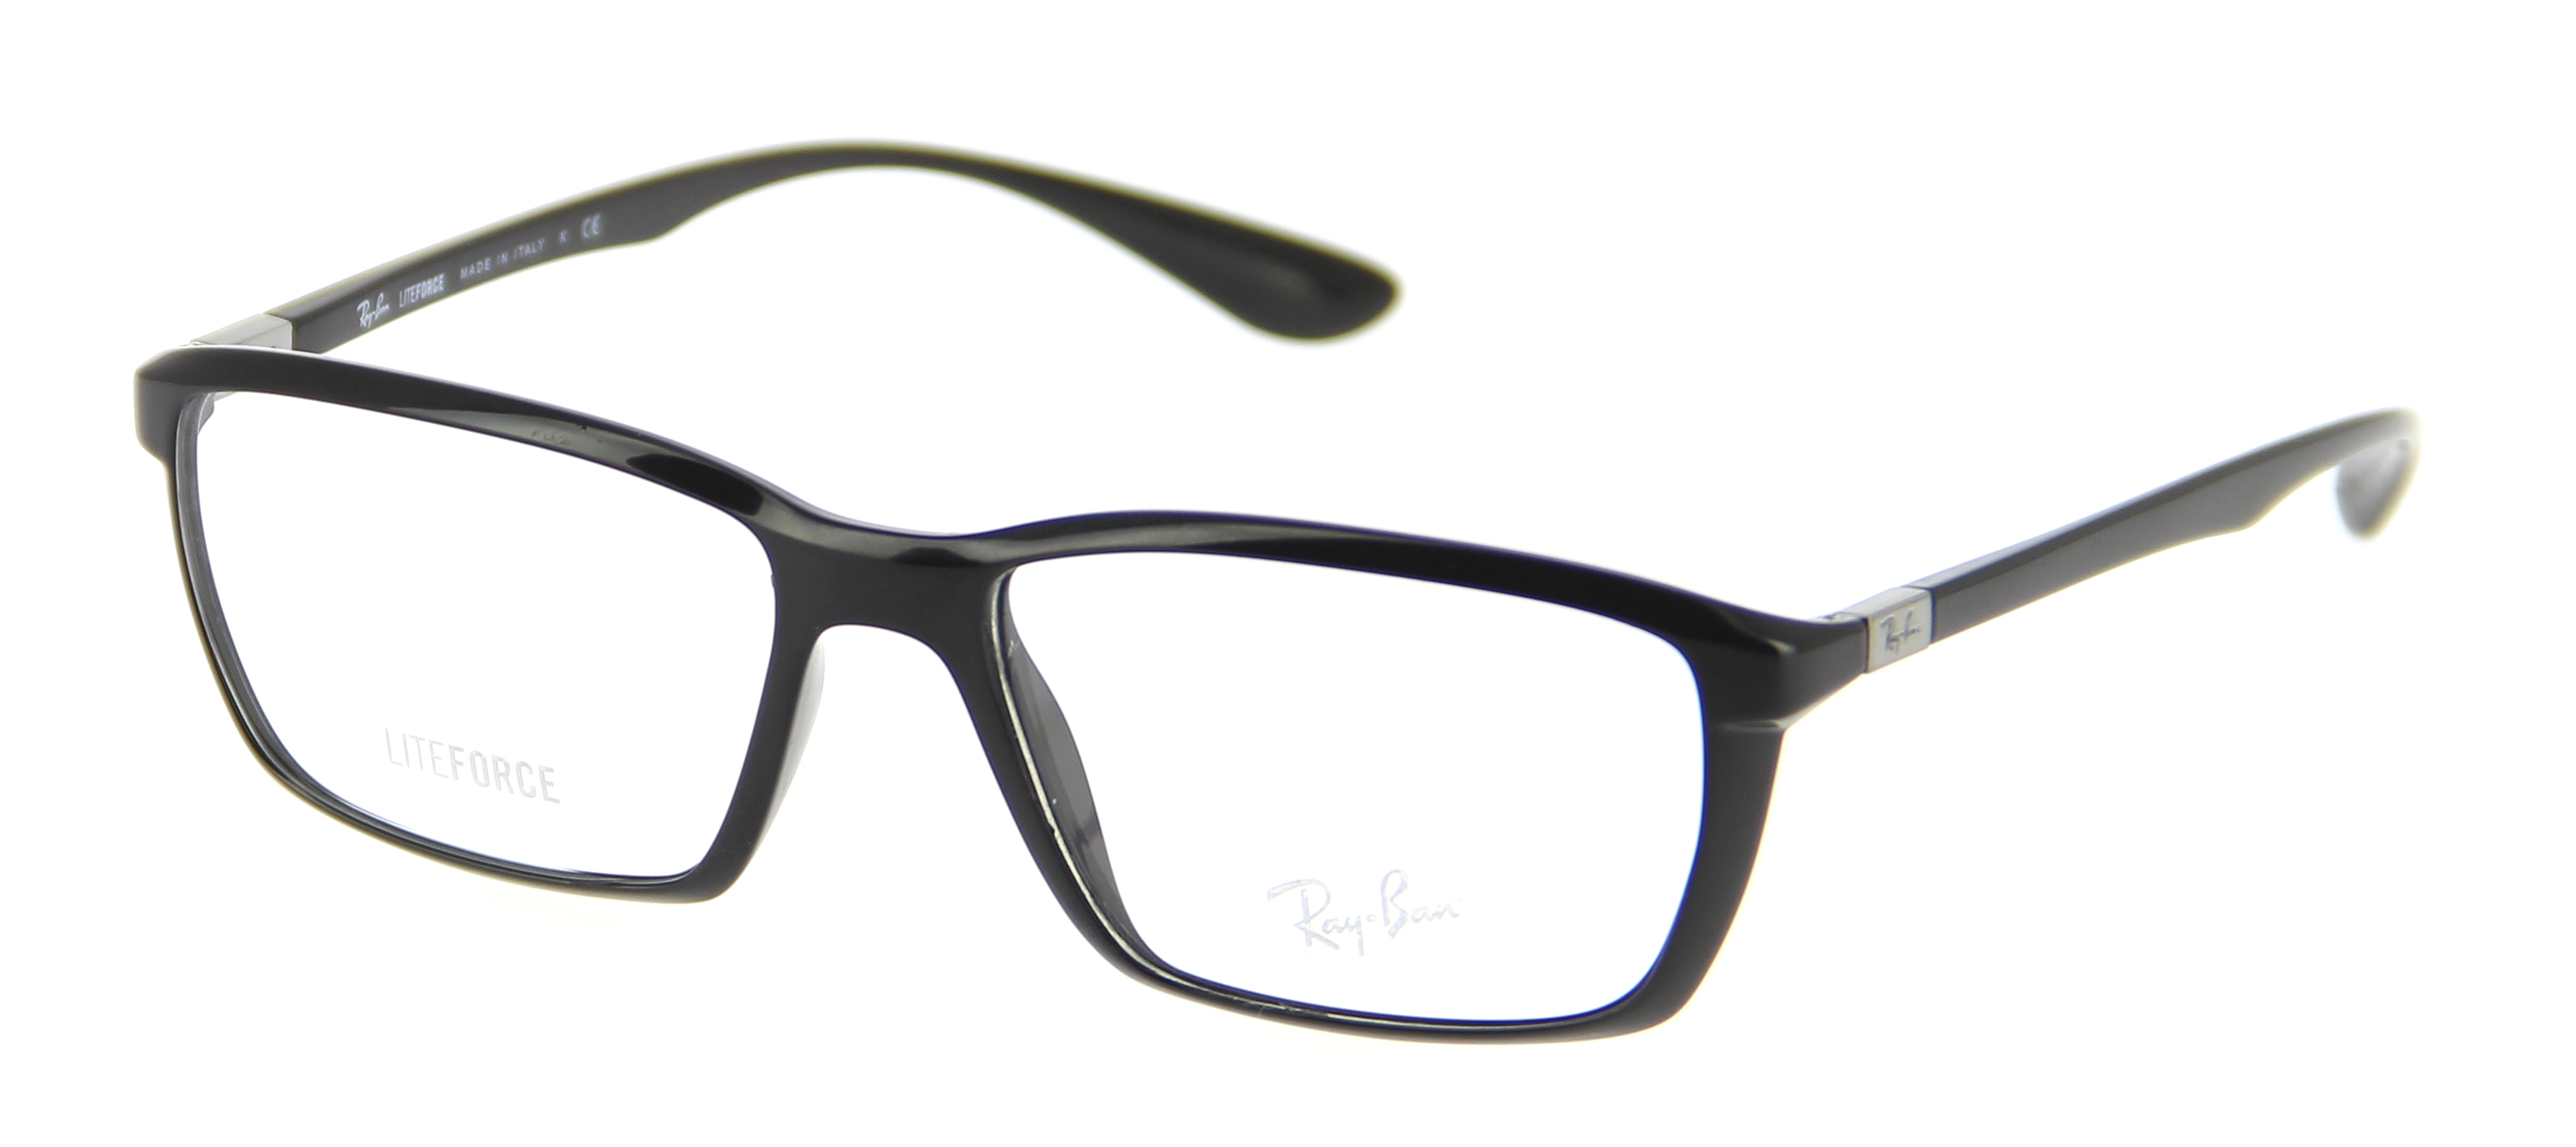 ray ban eyeglasses tucson